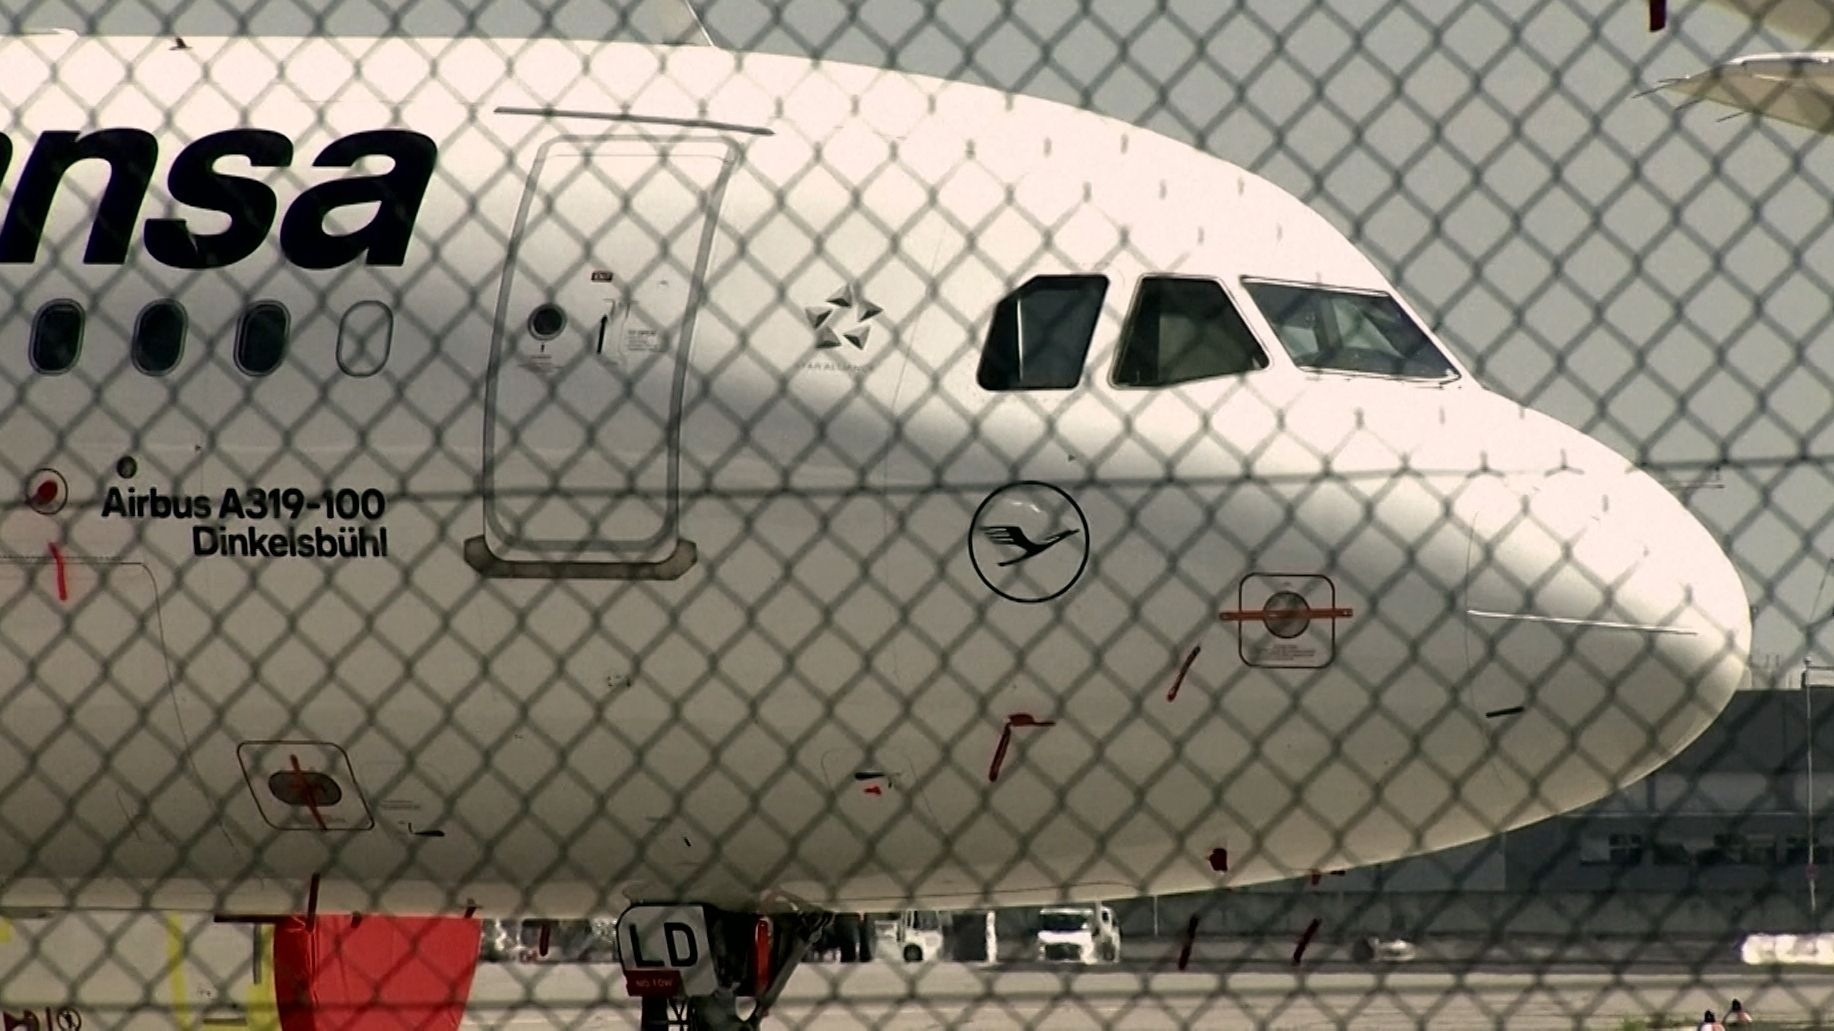 Lufthansa-Flugzeug